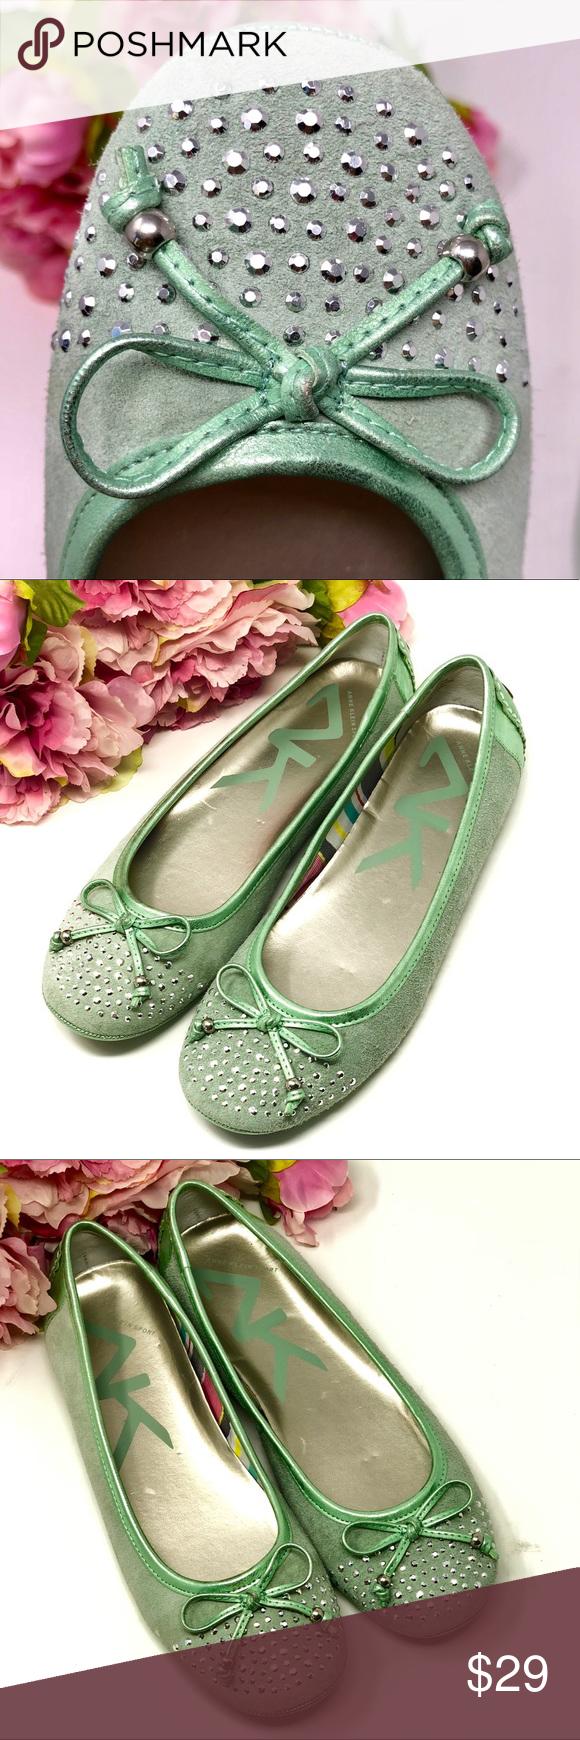 9ecad79942f ANNE KLEIN SPORT shoes ballet flats mint green 8 M Sweet and adorable ANNE  KLEIN SPORT